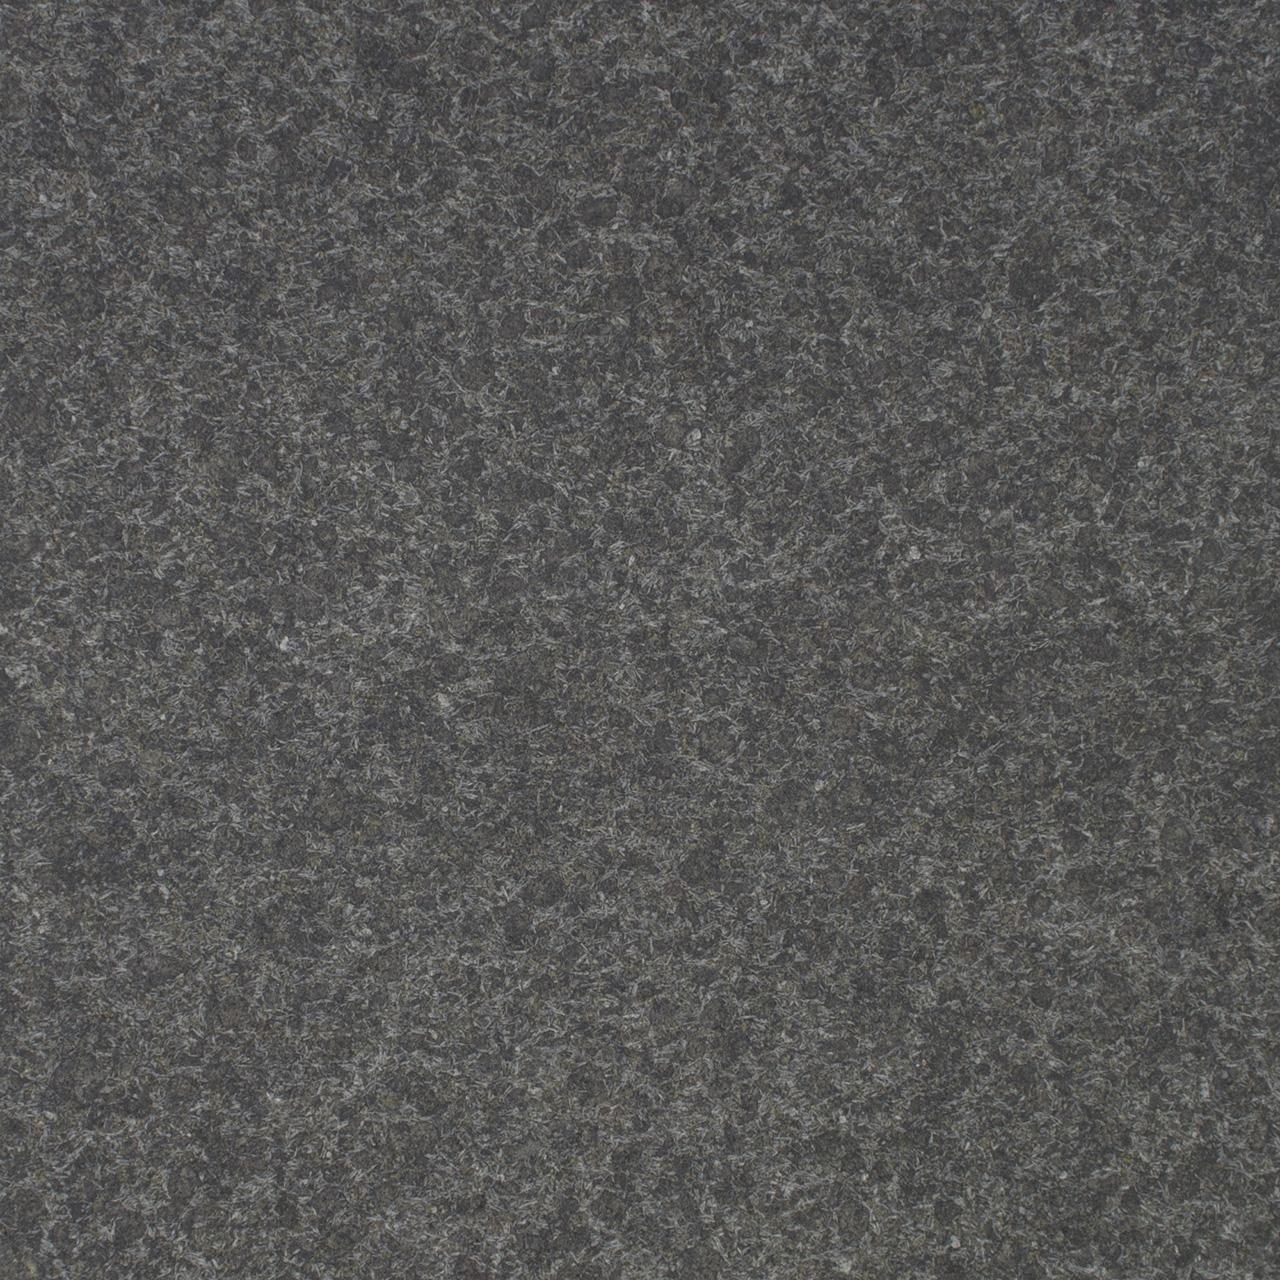 Chattis Black Basalt Cranbourne Stone